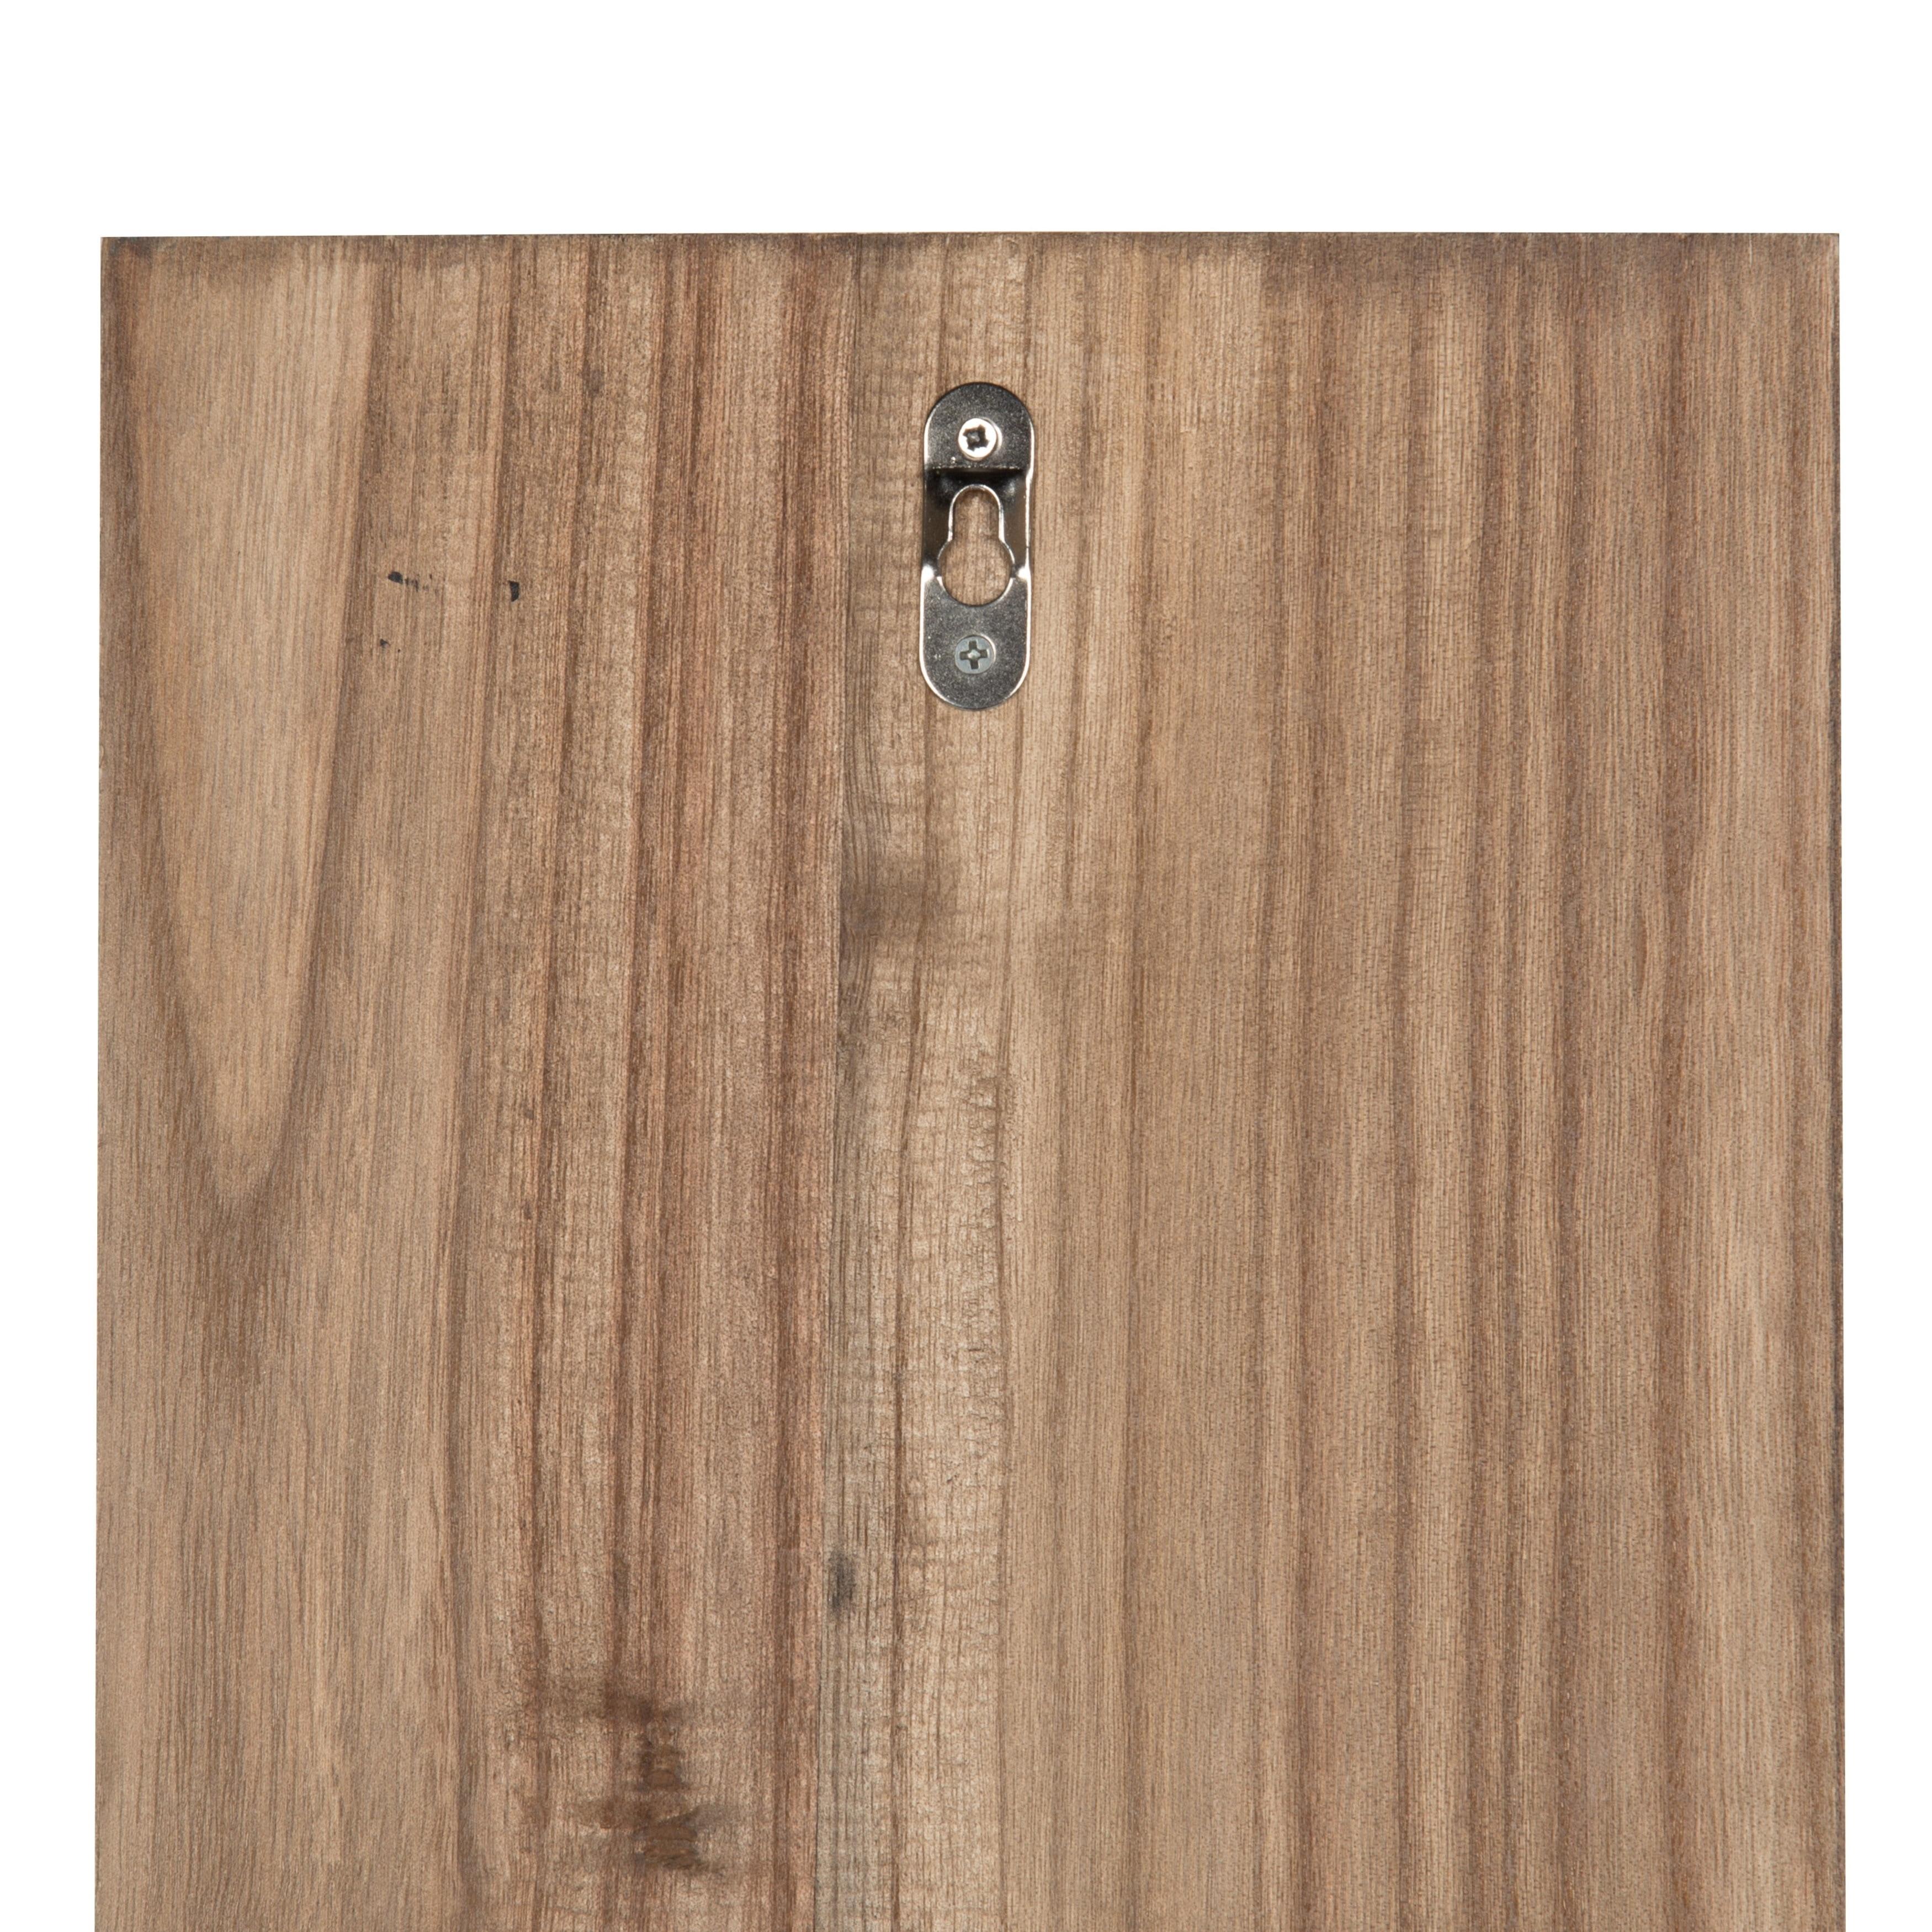 Kate and laurel growth chart 65 wood wall ruler free shipping kate and laurel growth chart 65 wood wall ruler free shipping today overstock 23979898 geenschuldenfo Choice Image